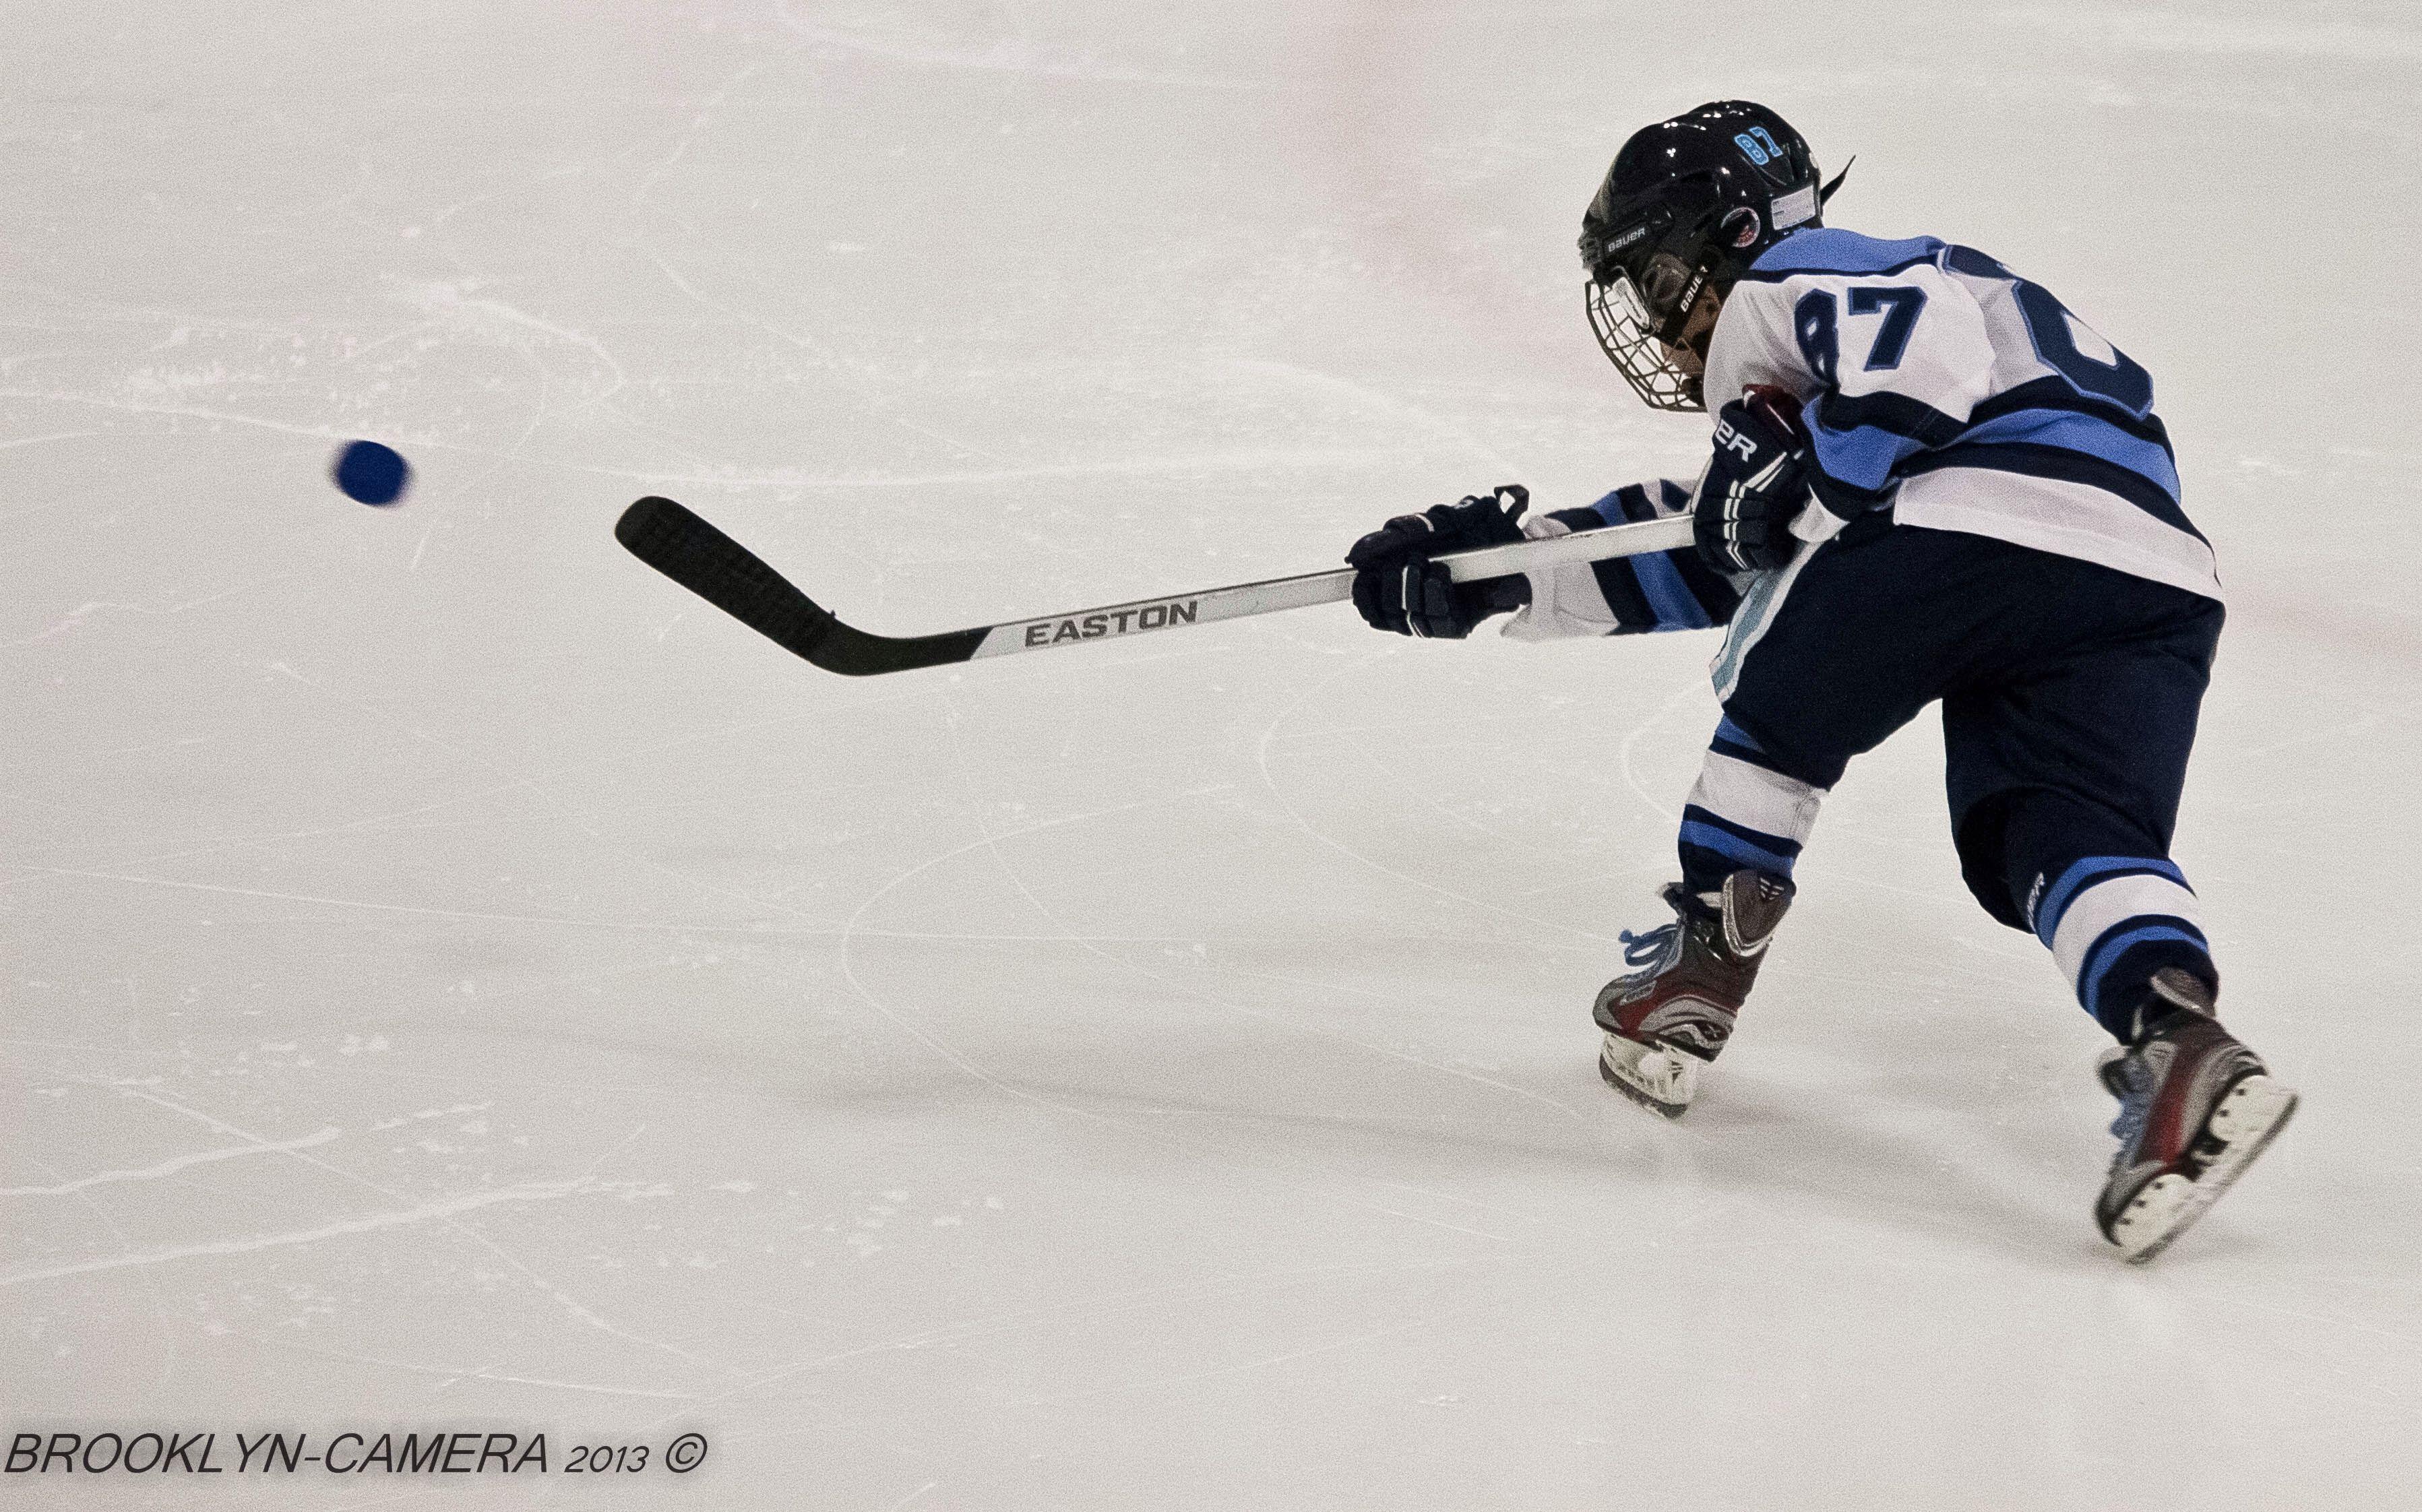 Pal hockey